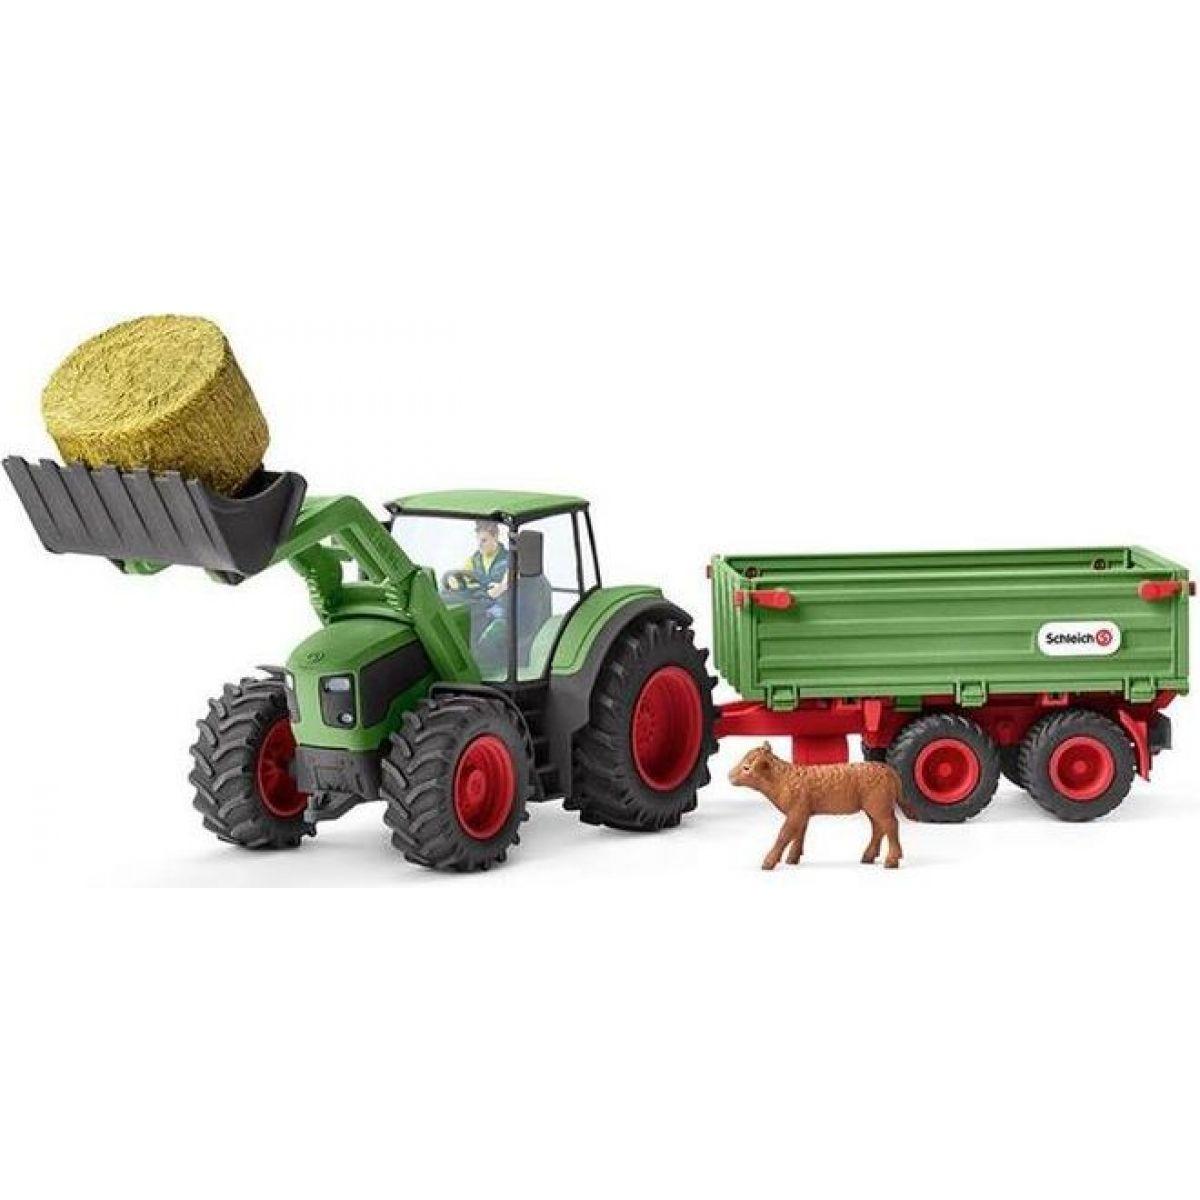 Schleich 42379 Traktor s vlekem - Poškozený obal